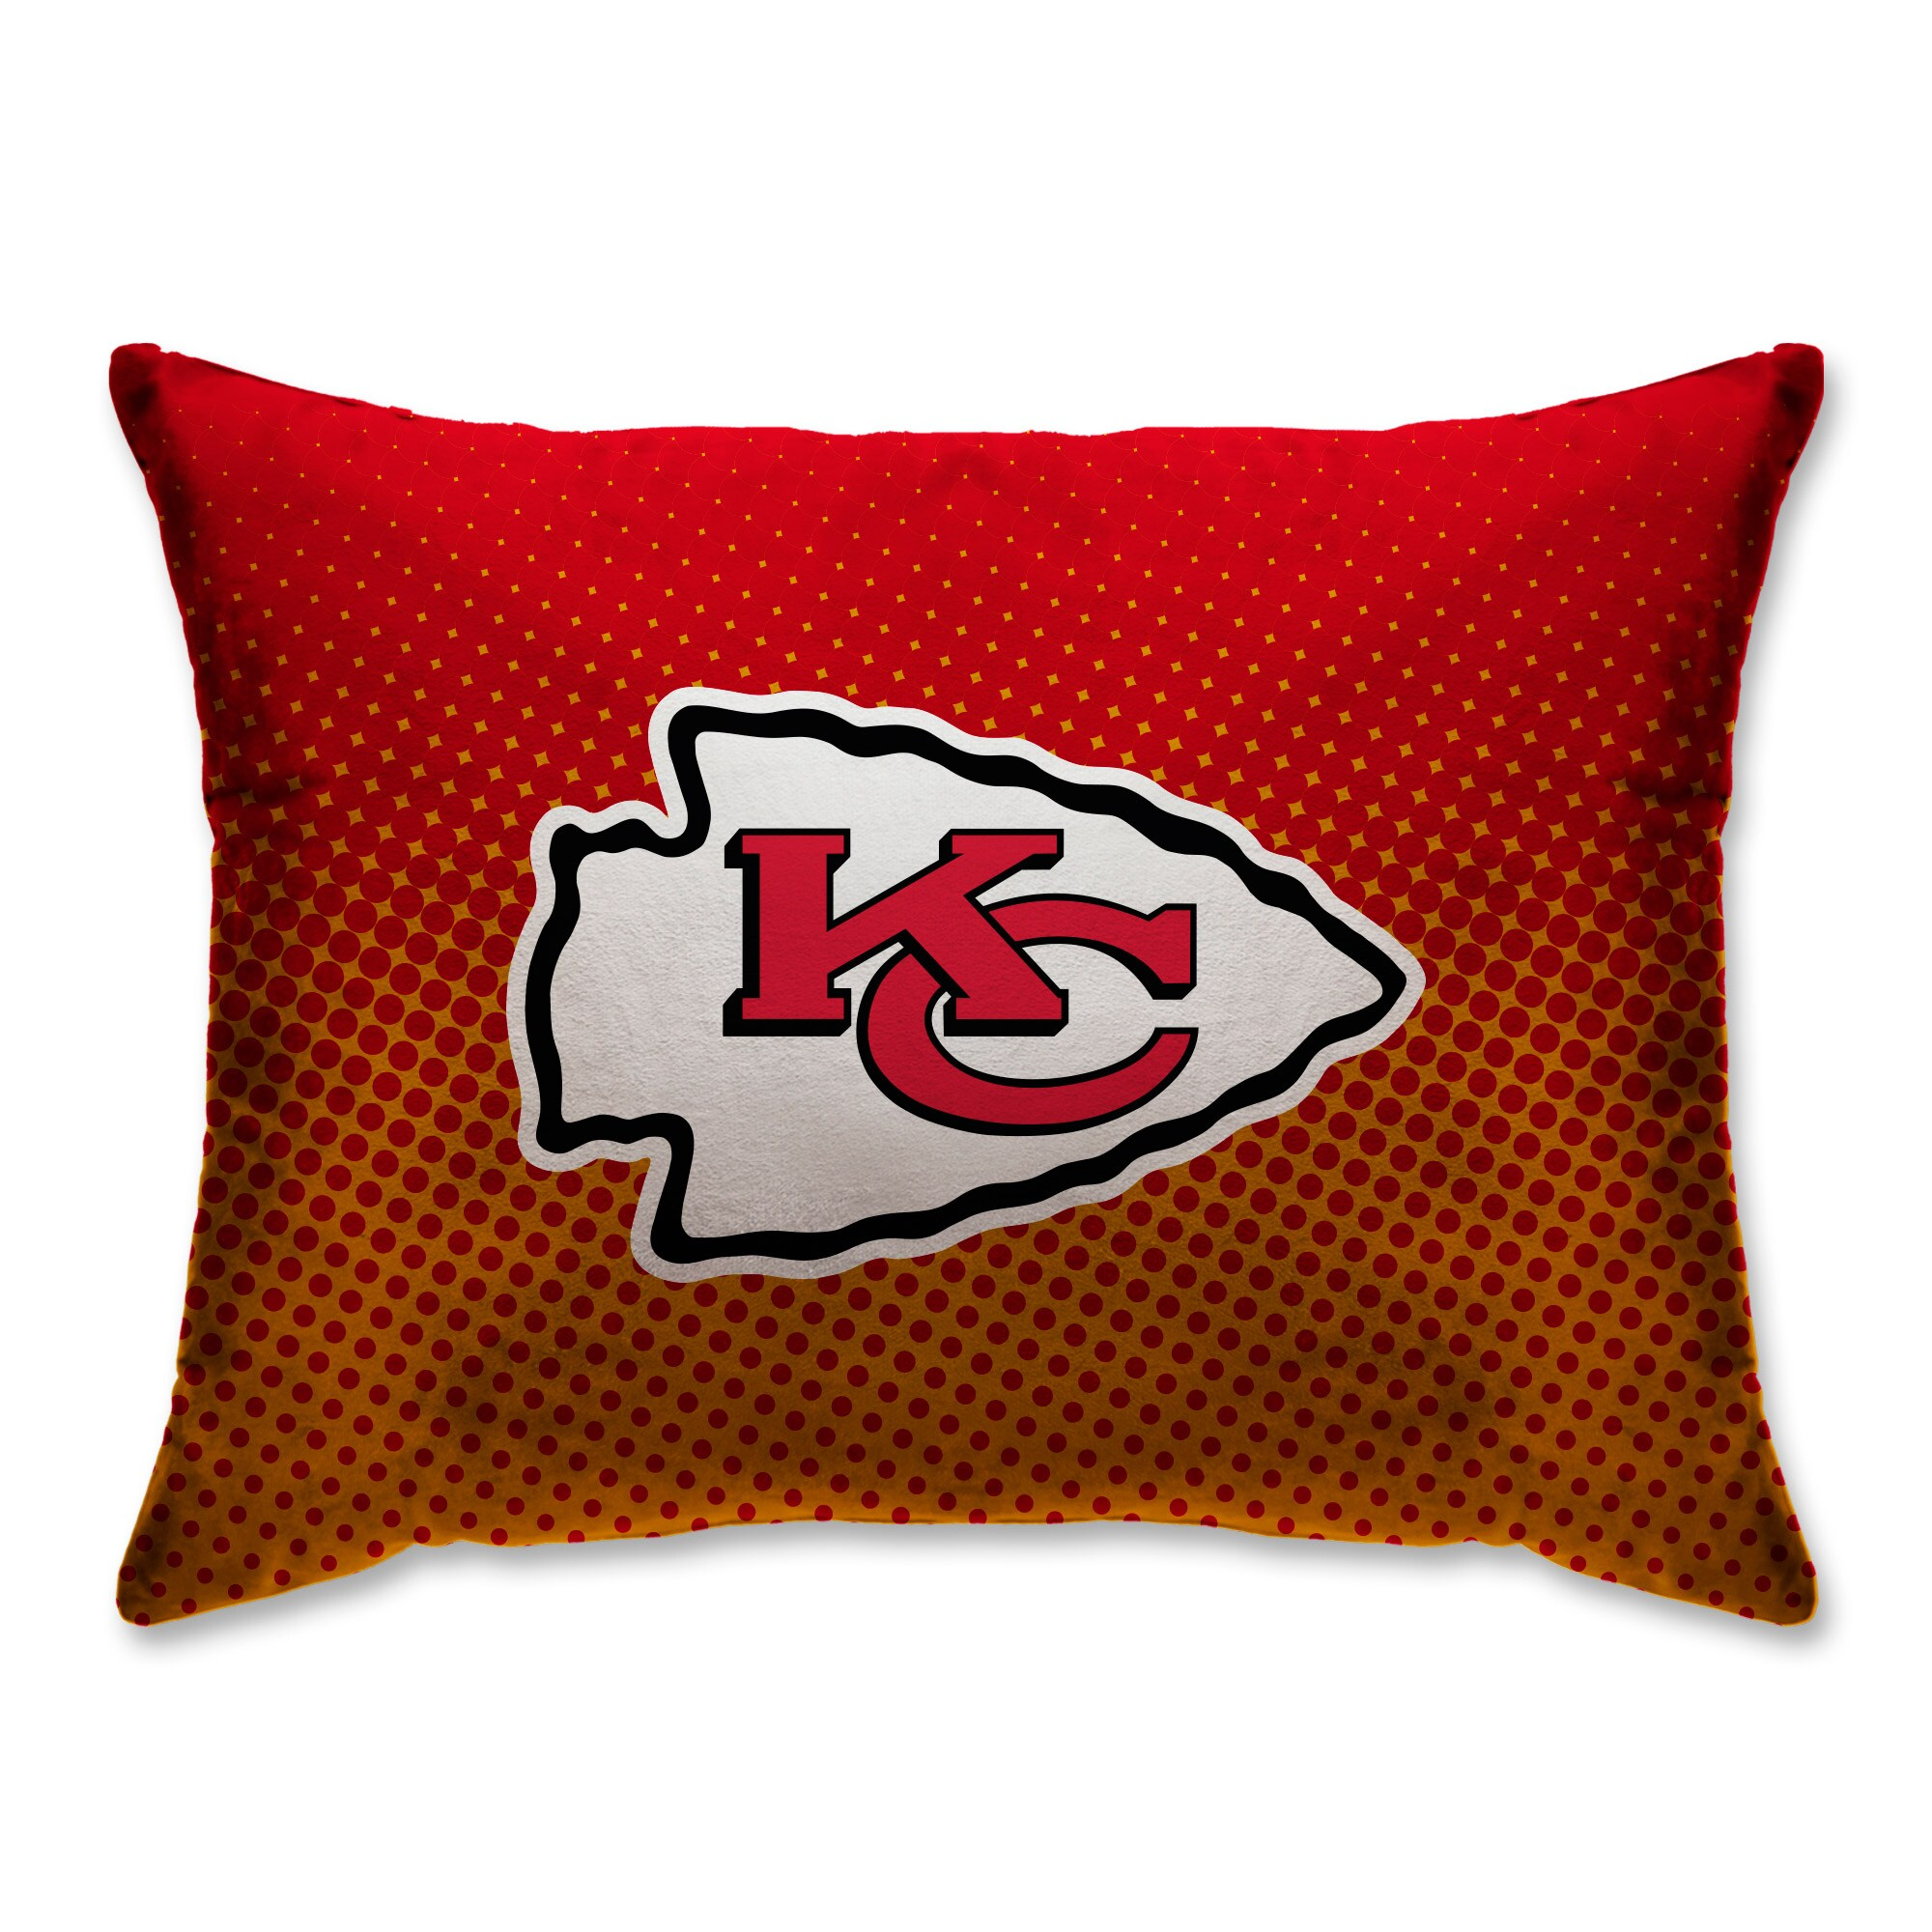 "Kansas City Chiefs 20"" x 26"" Dot Decorative Bed Pillow"